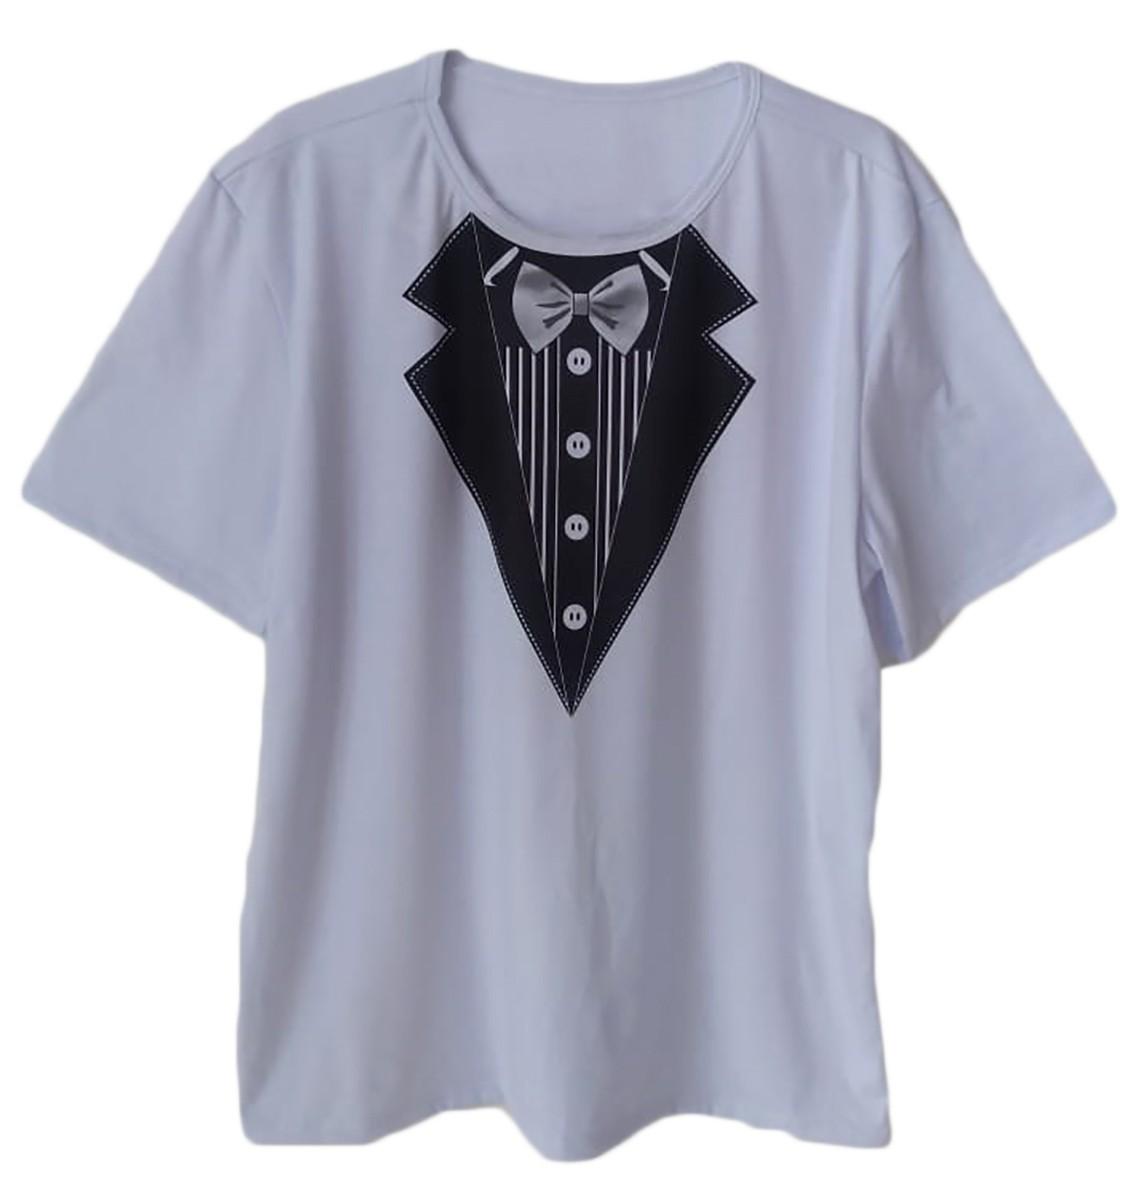 Camiseta adulta masculina chá bar noivo estampa gravata